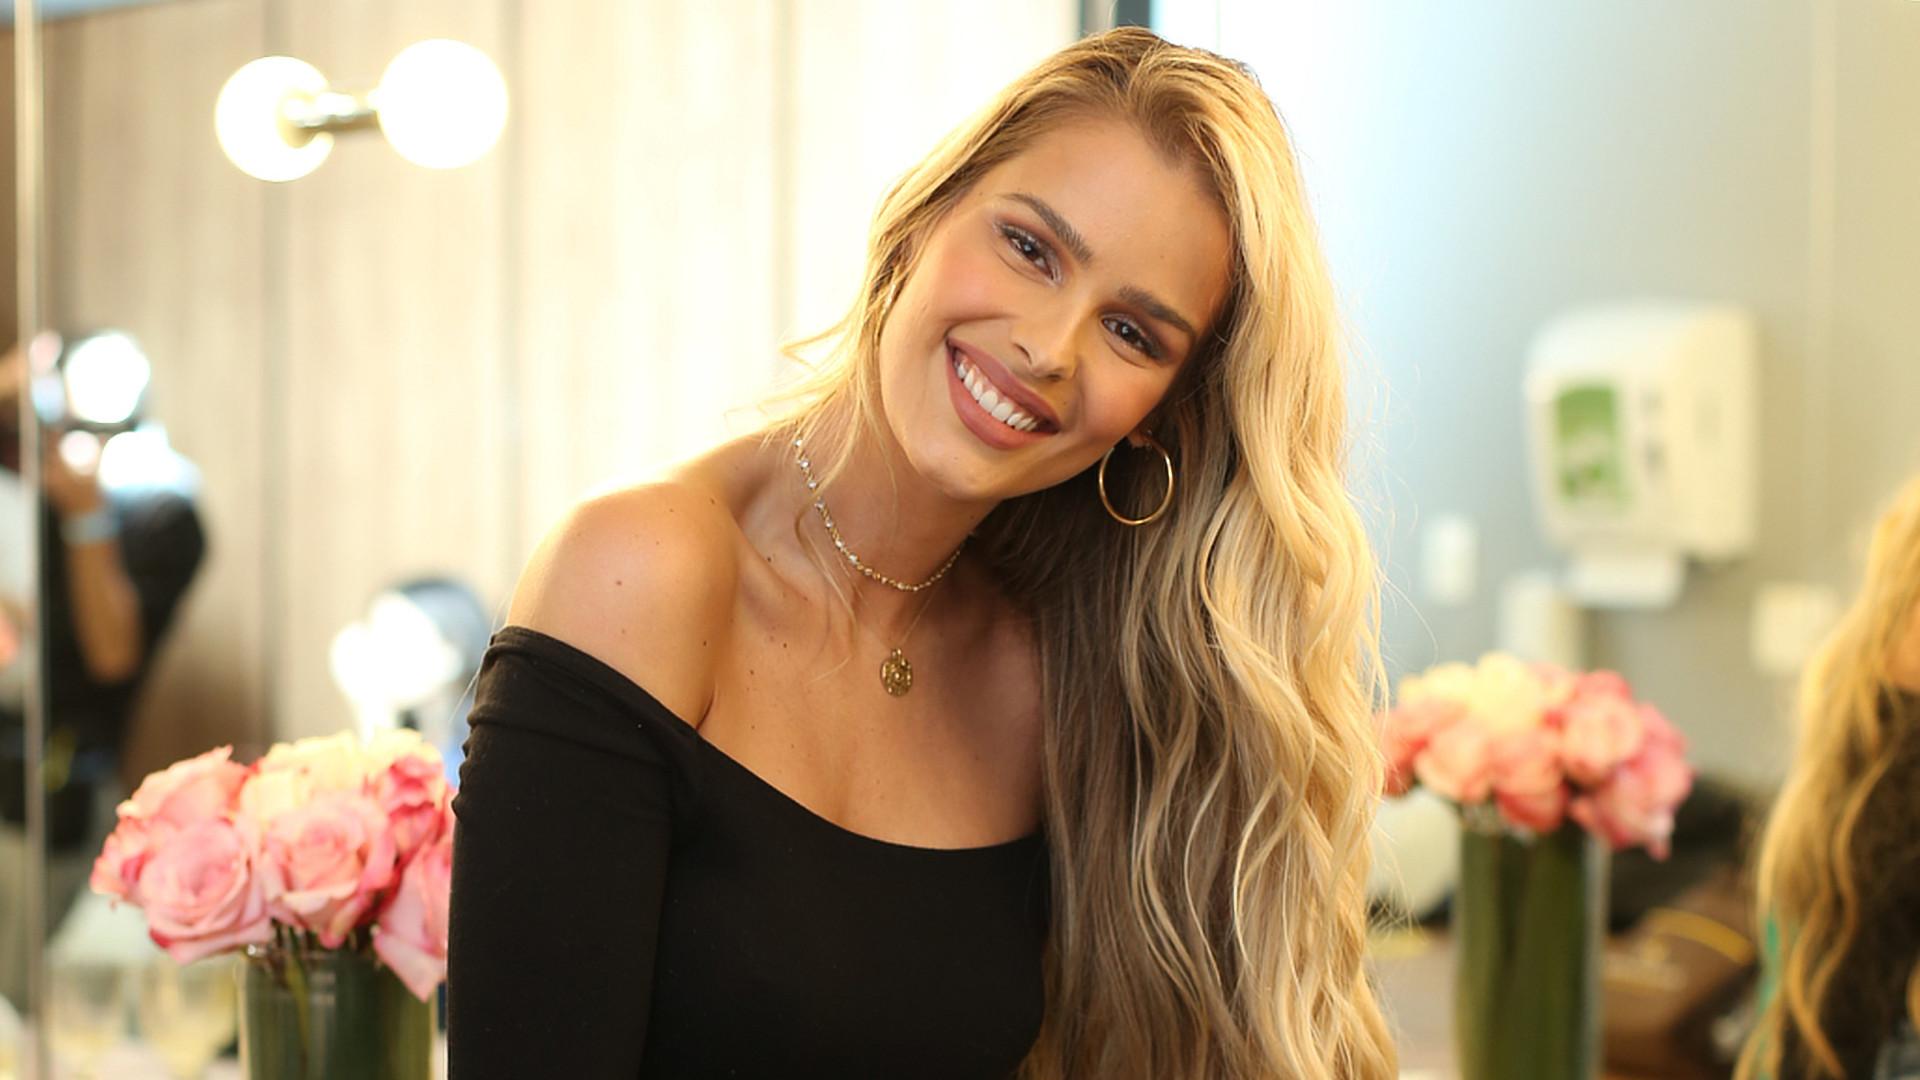 Yasmin Brunet perde R$ 7,9 mil em golpe de aplicativo de entregas